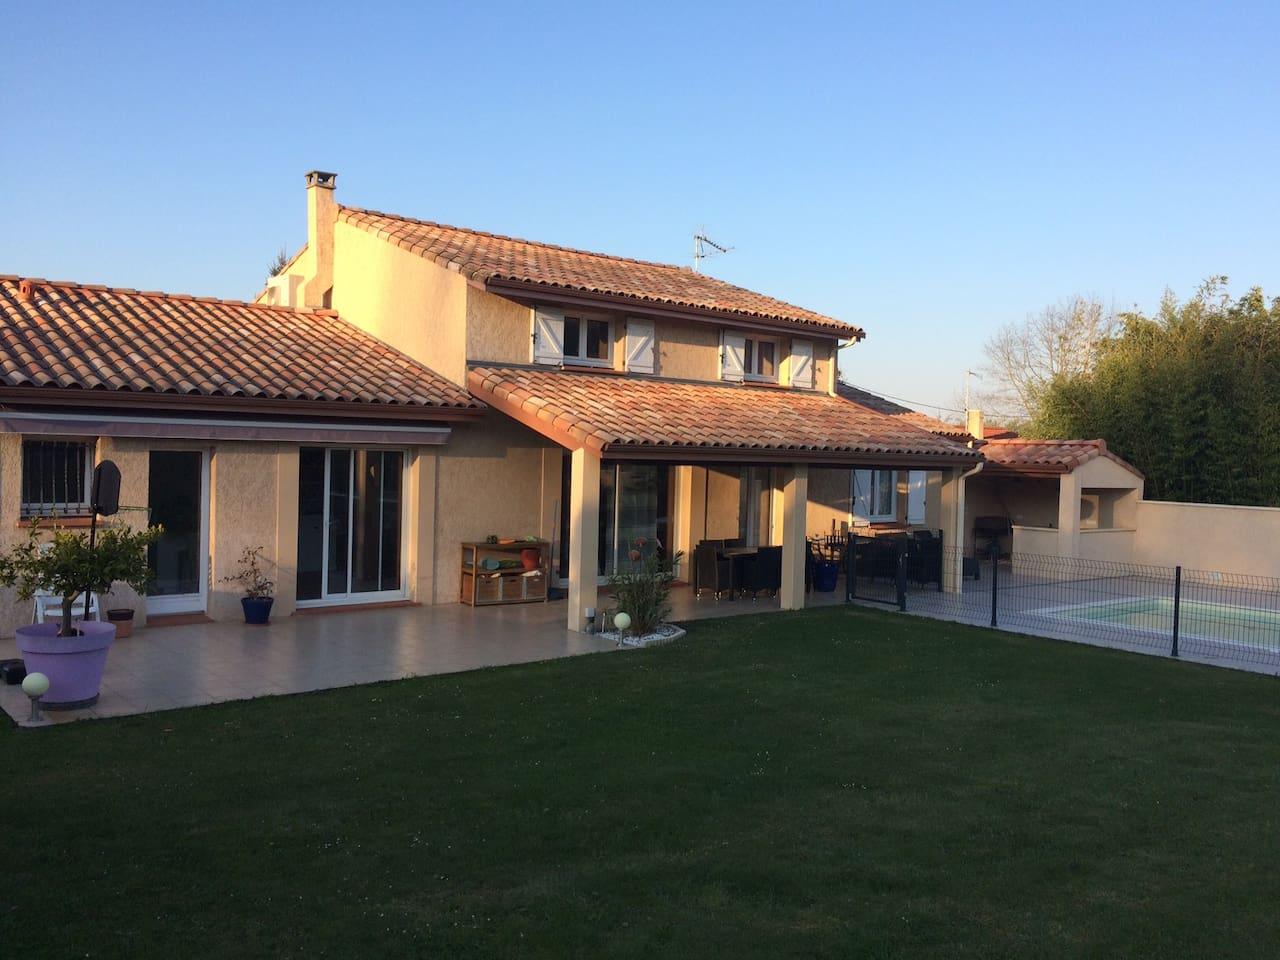 Maison avec grande terrasse exposée plein sud